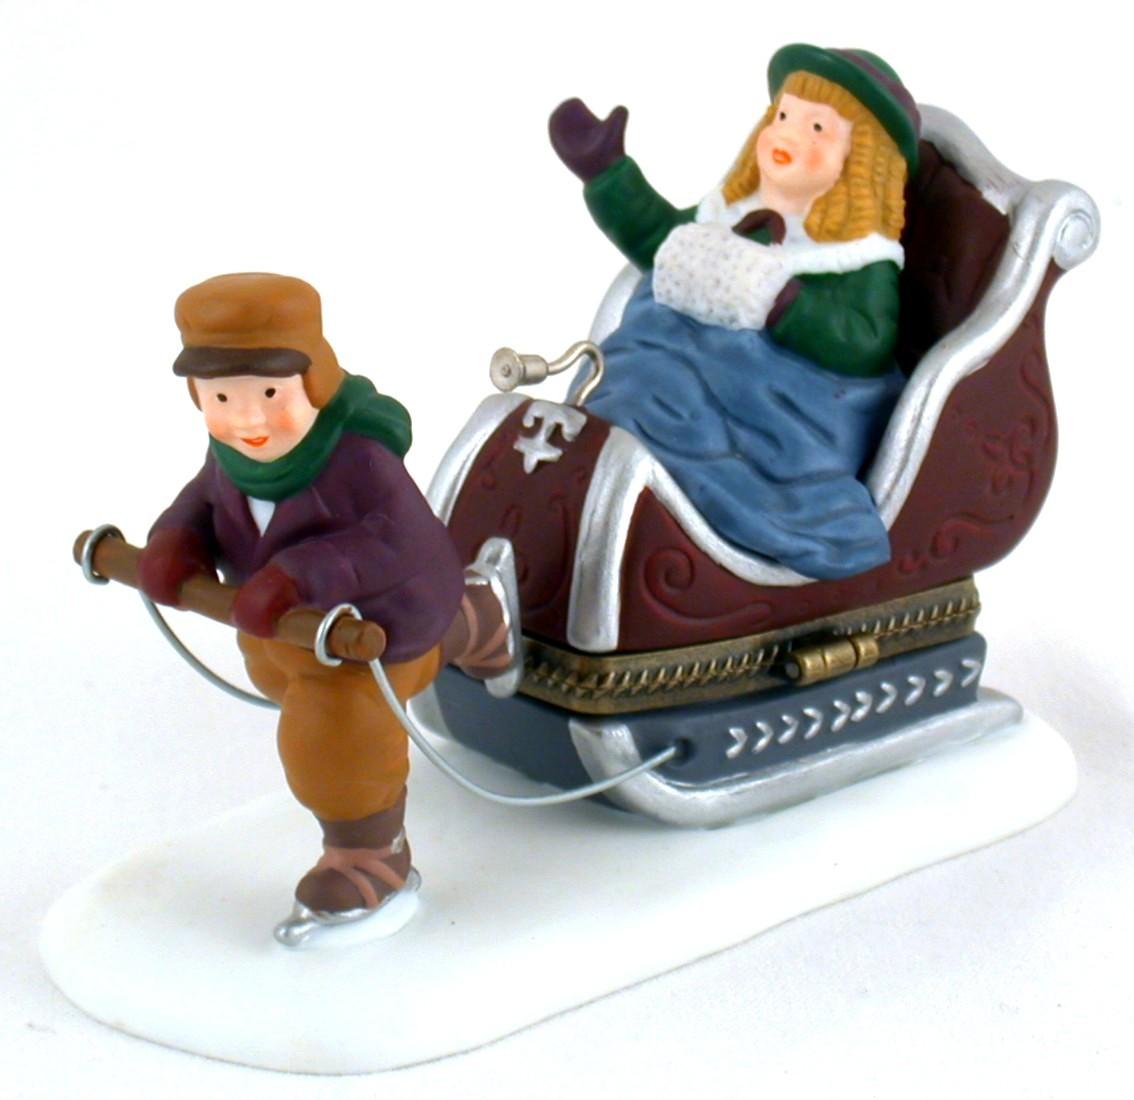 Dept 56 Heritage Village Sleighride Trinket Box Figure 57502 - $9.00